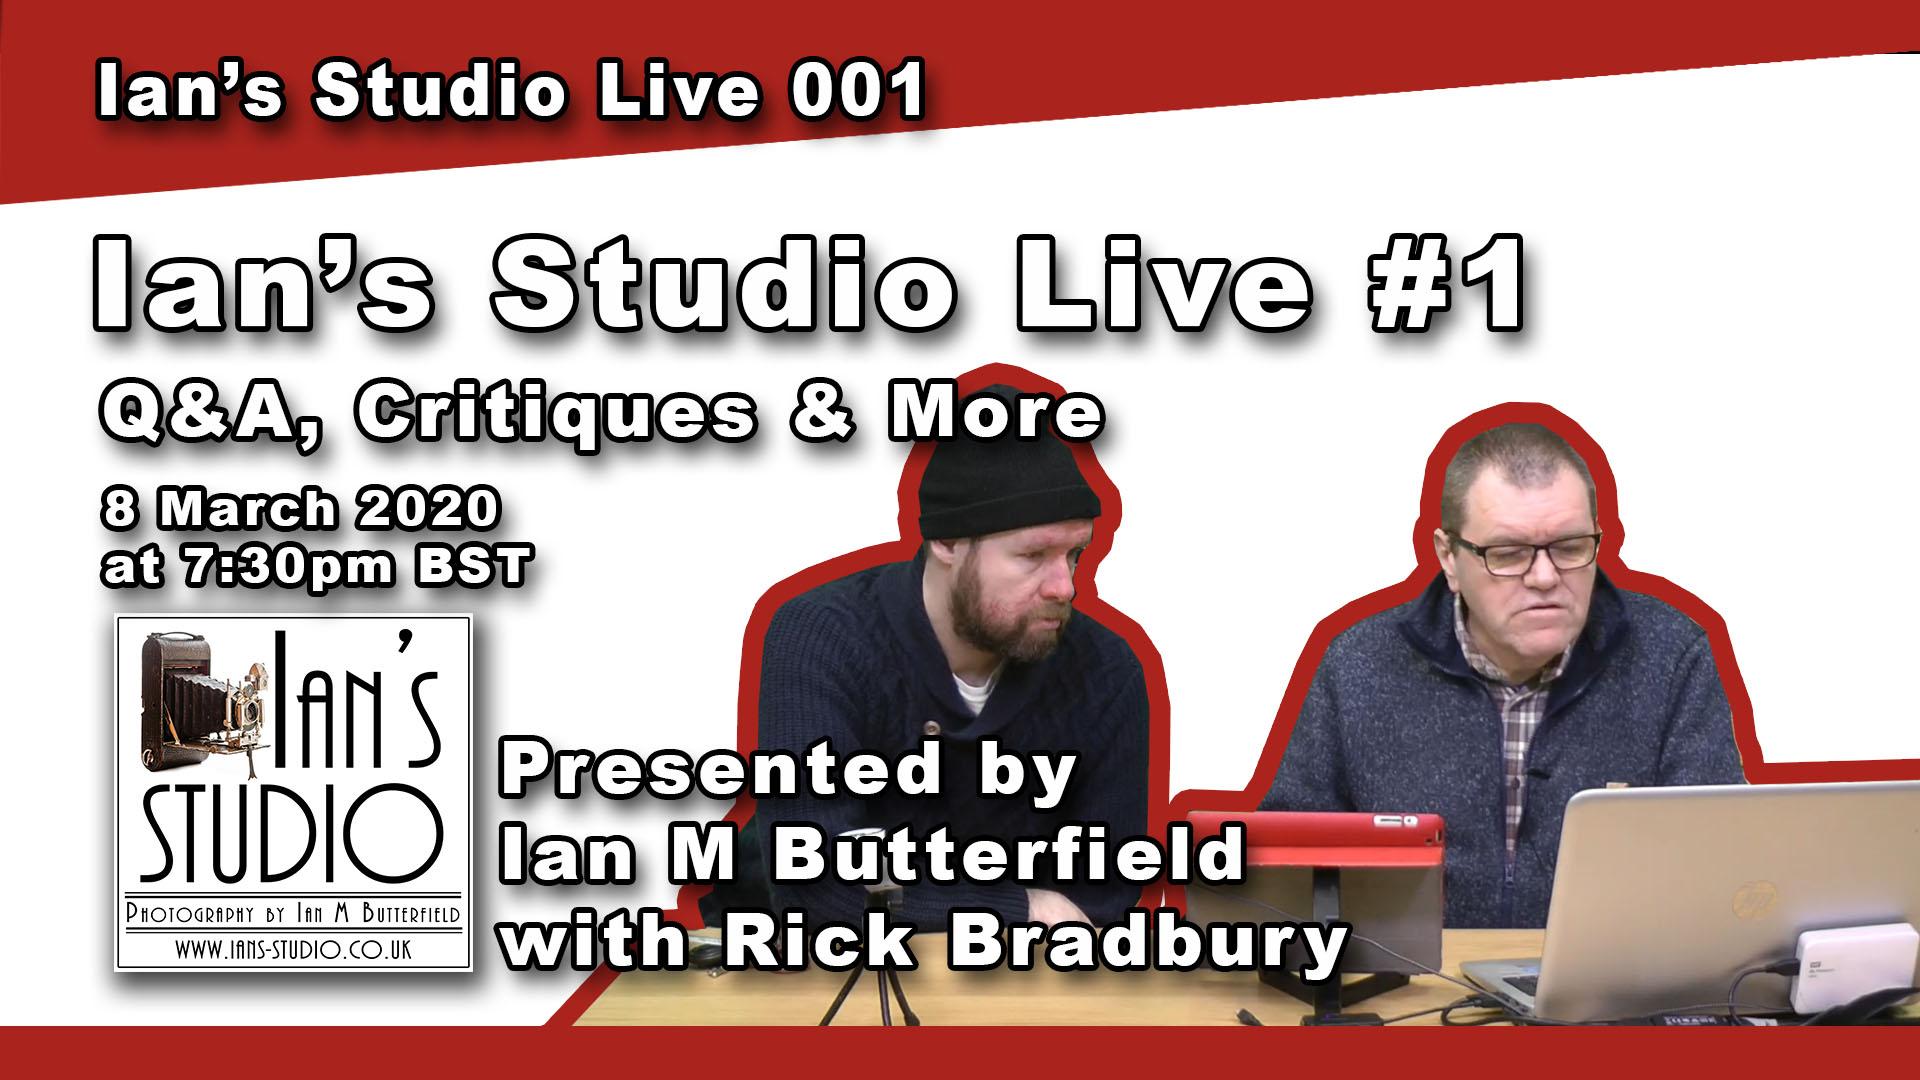 6 Mar 2020 NEWS: Ian's Studio Live! (Sunday at 7:30pm)